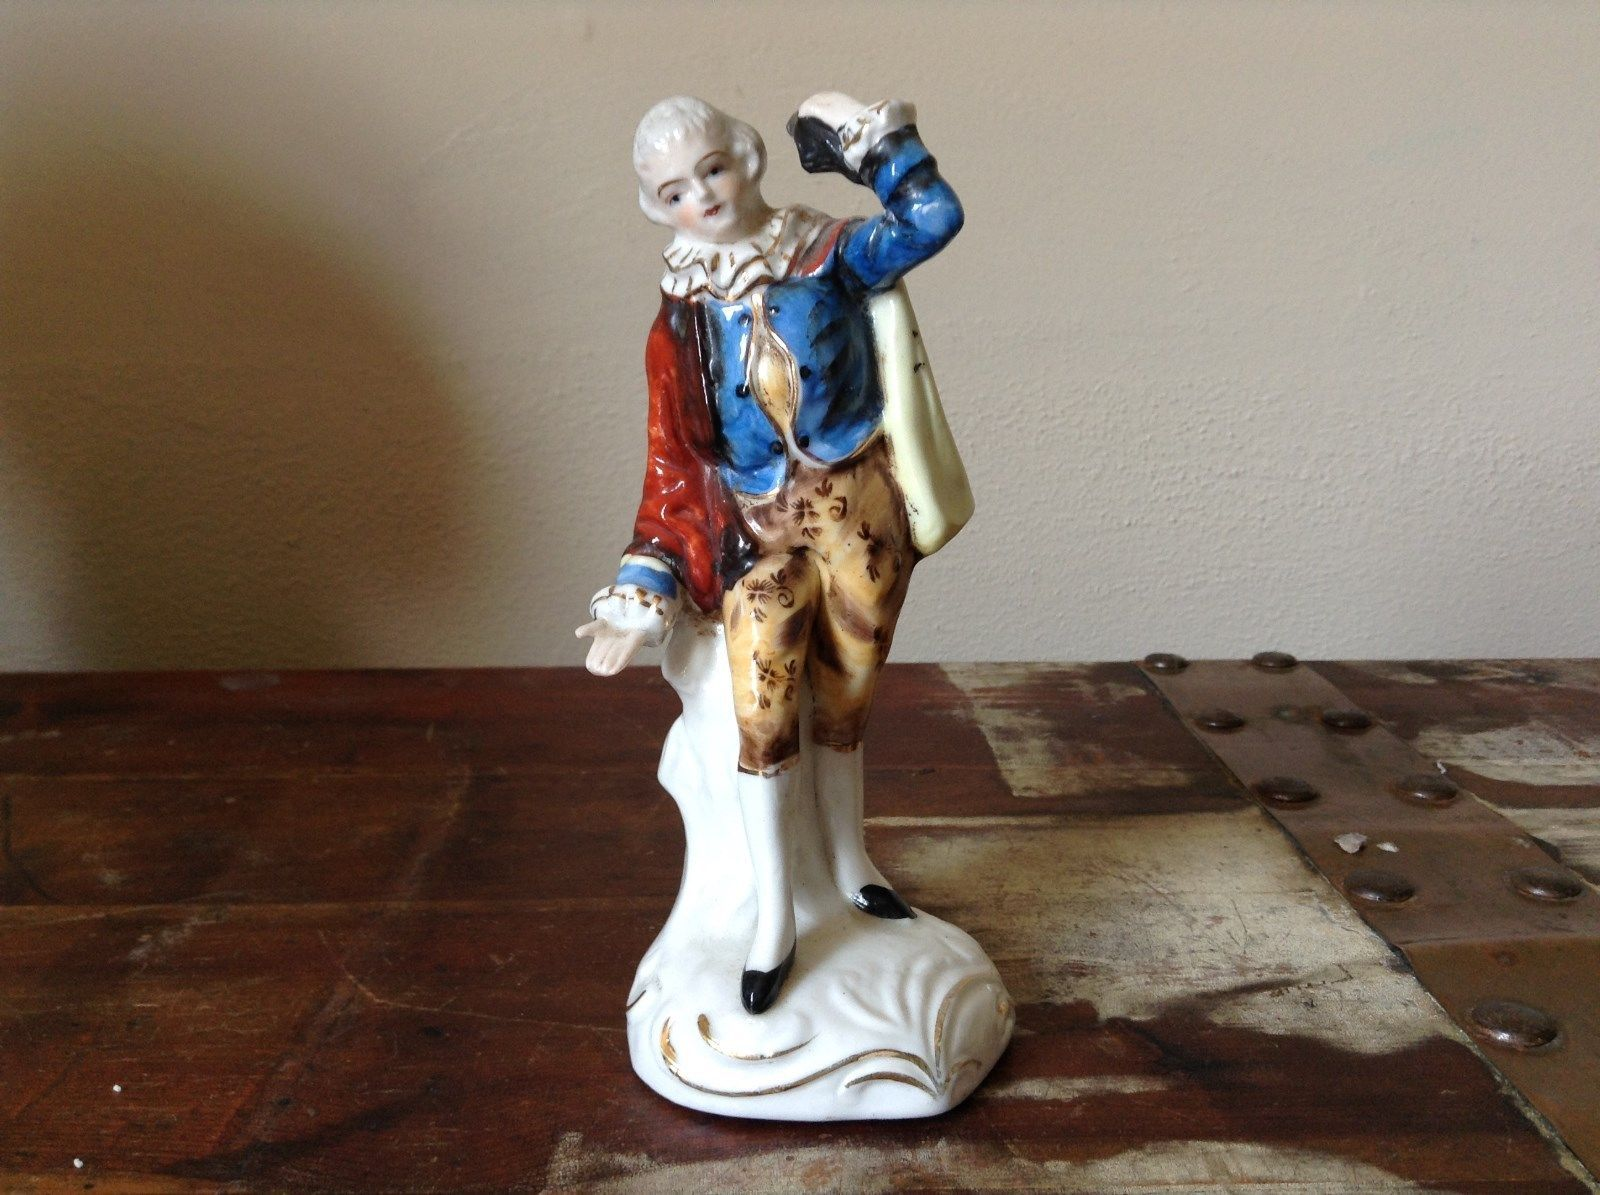 Vintage Ceramic Japanese Figurine Hand Painted Man in Blue Shirt